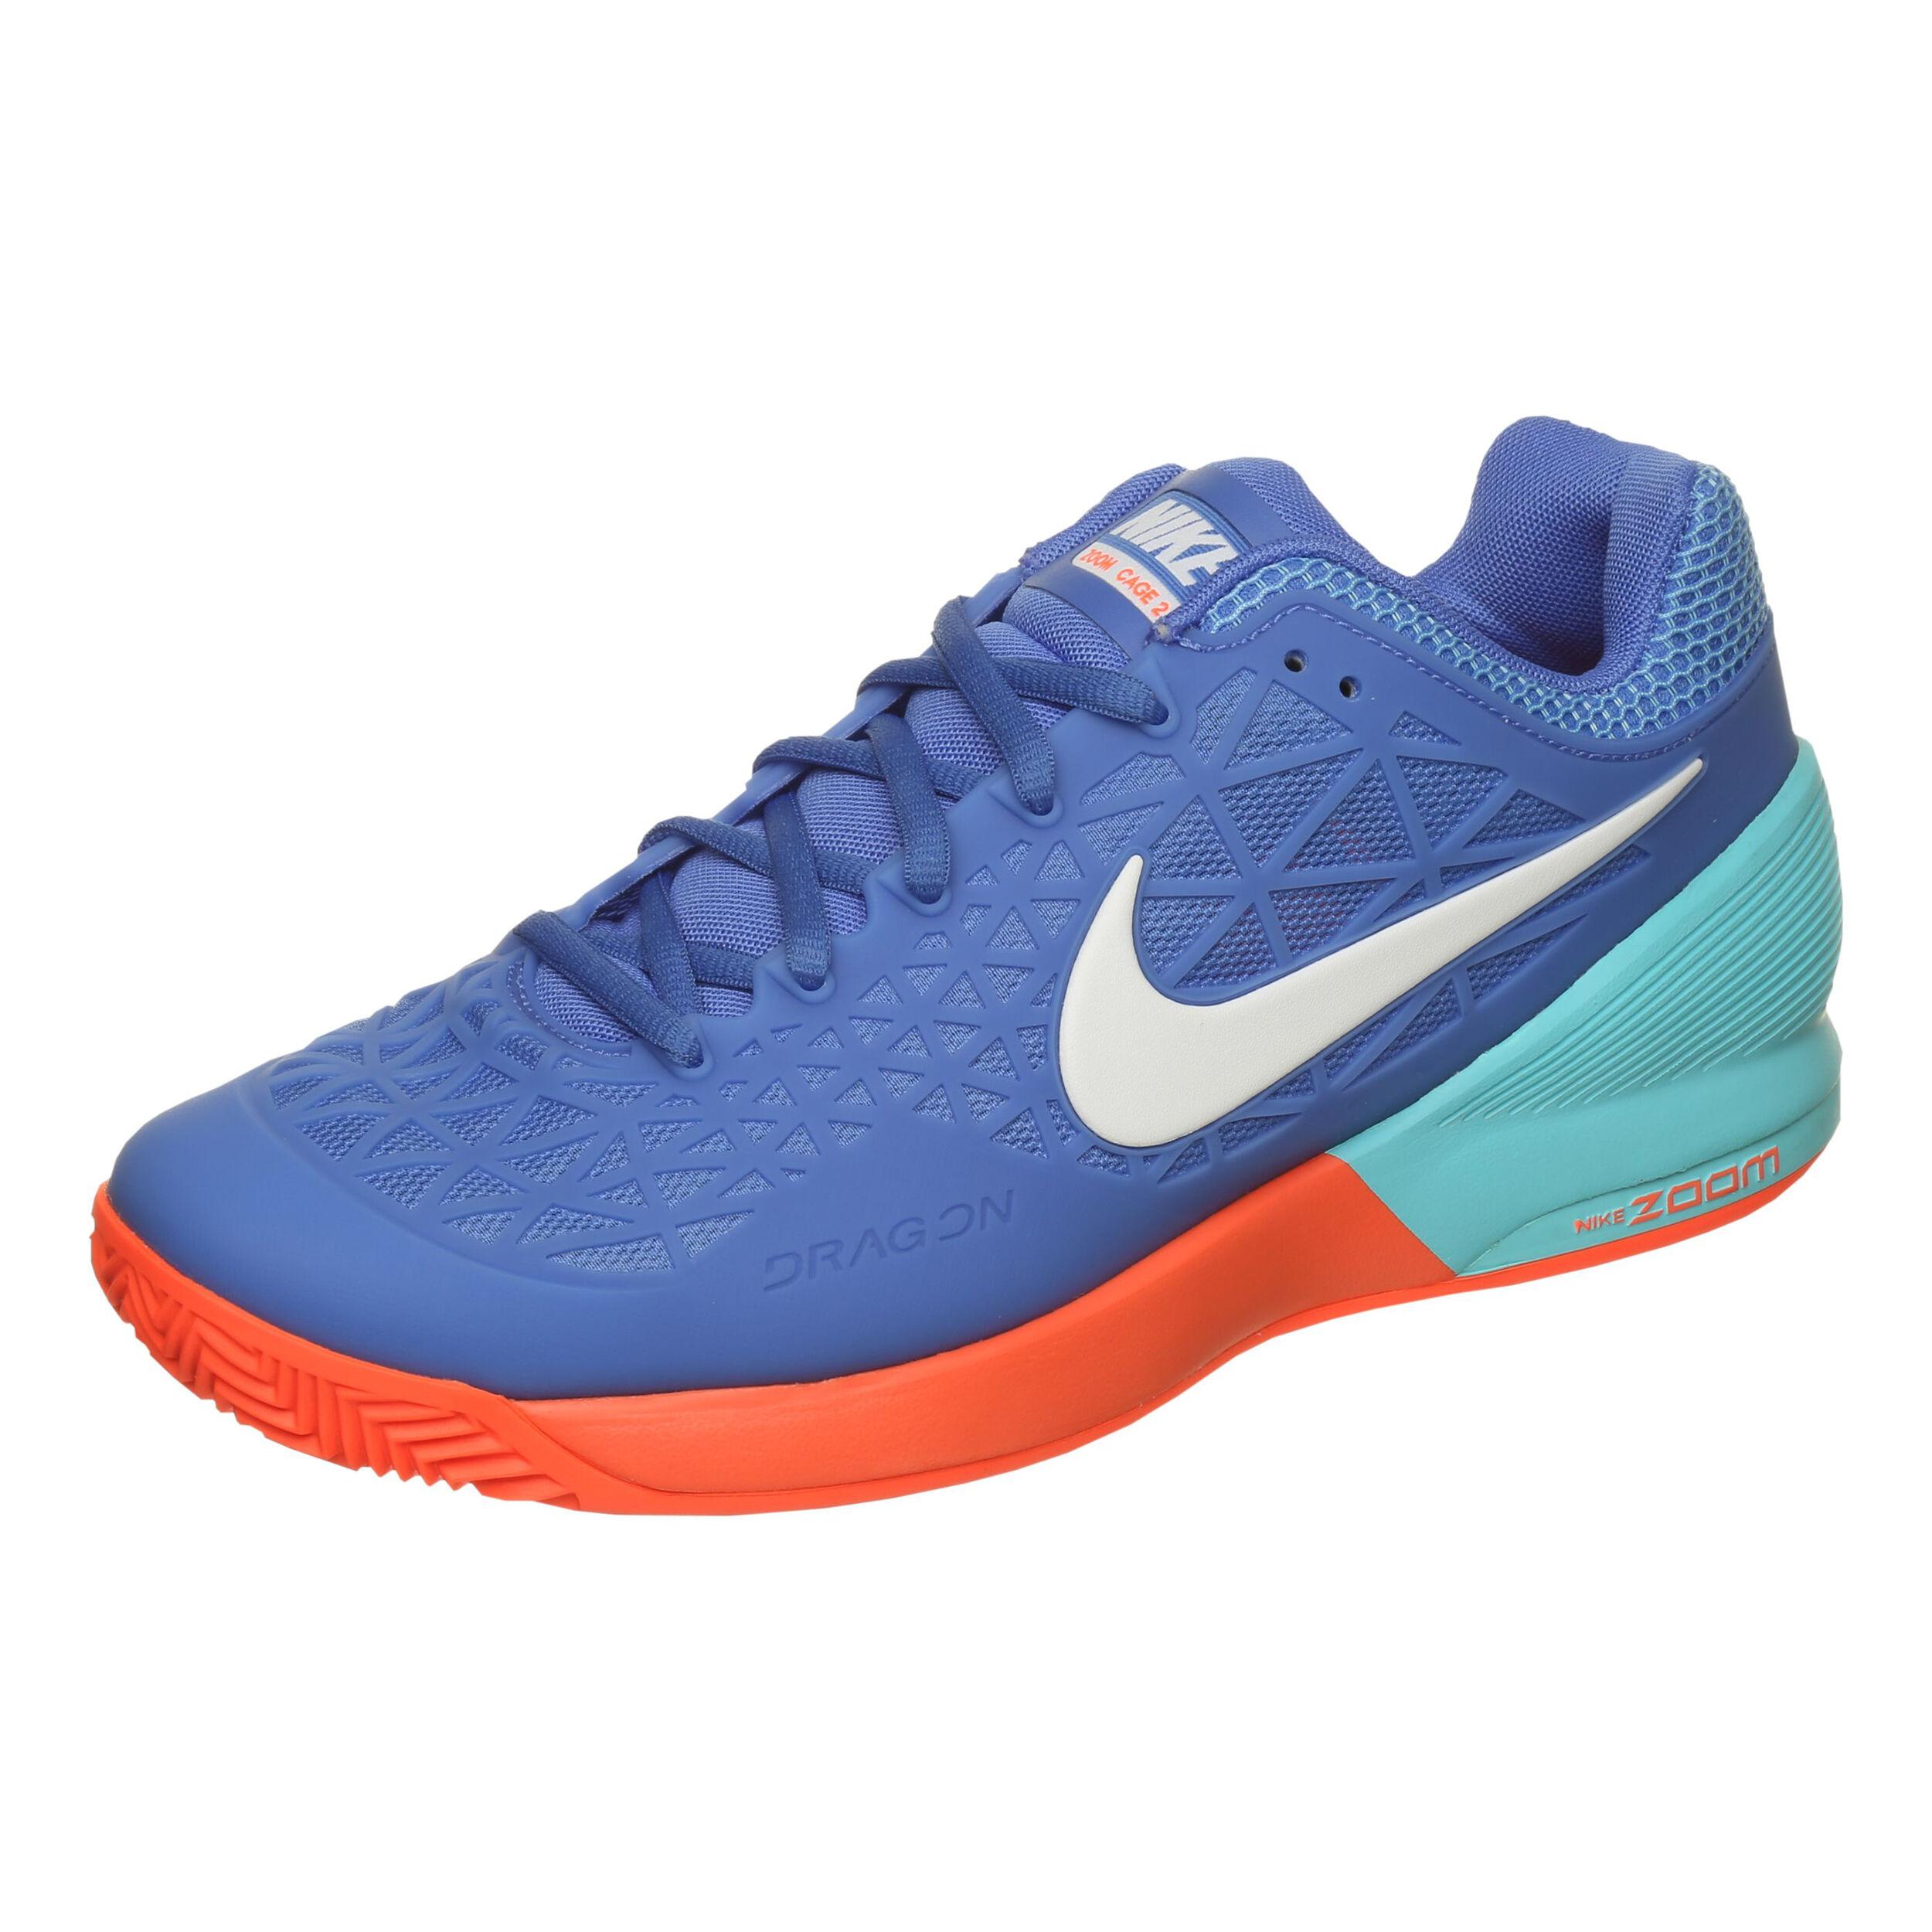 Nike Zoom Cage 2 Clay Scarpa Per Terra Rossa Uomini Blu